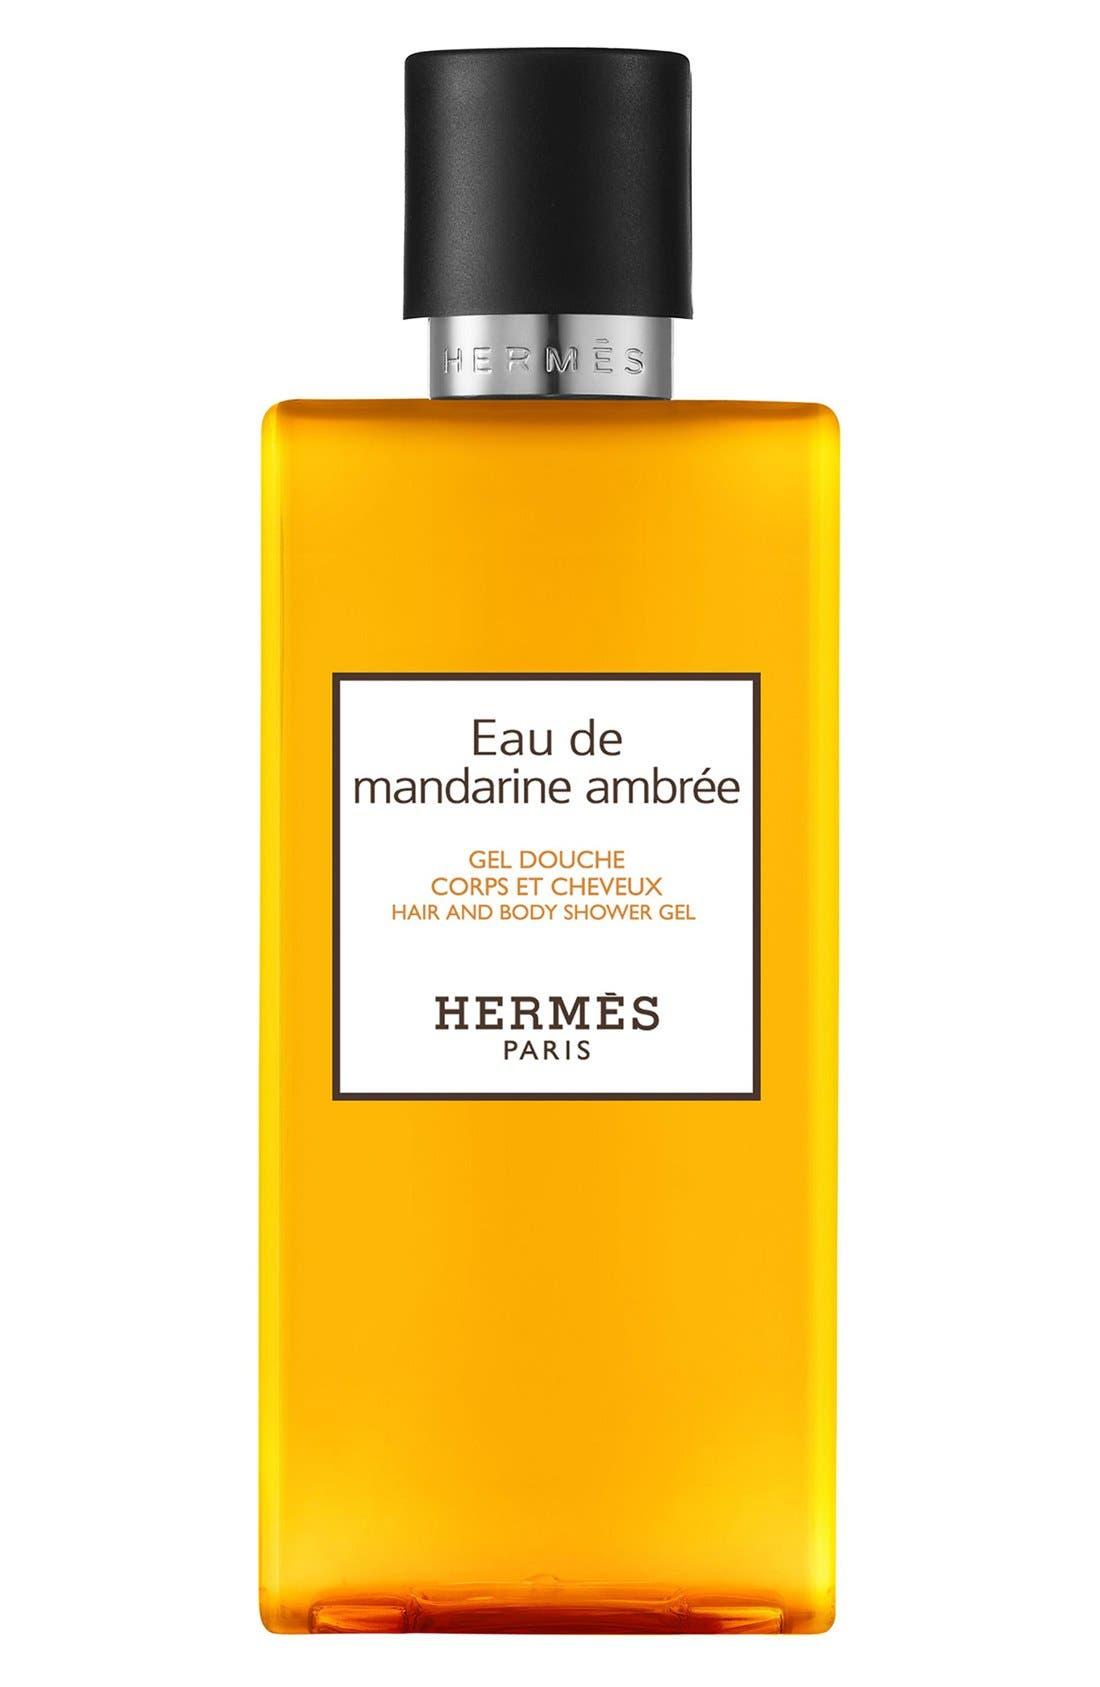 Hermès Eau de Mandarine Ambrée - Hair and body shower gel